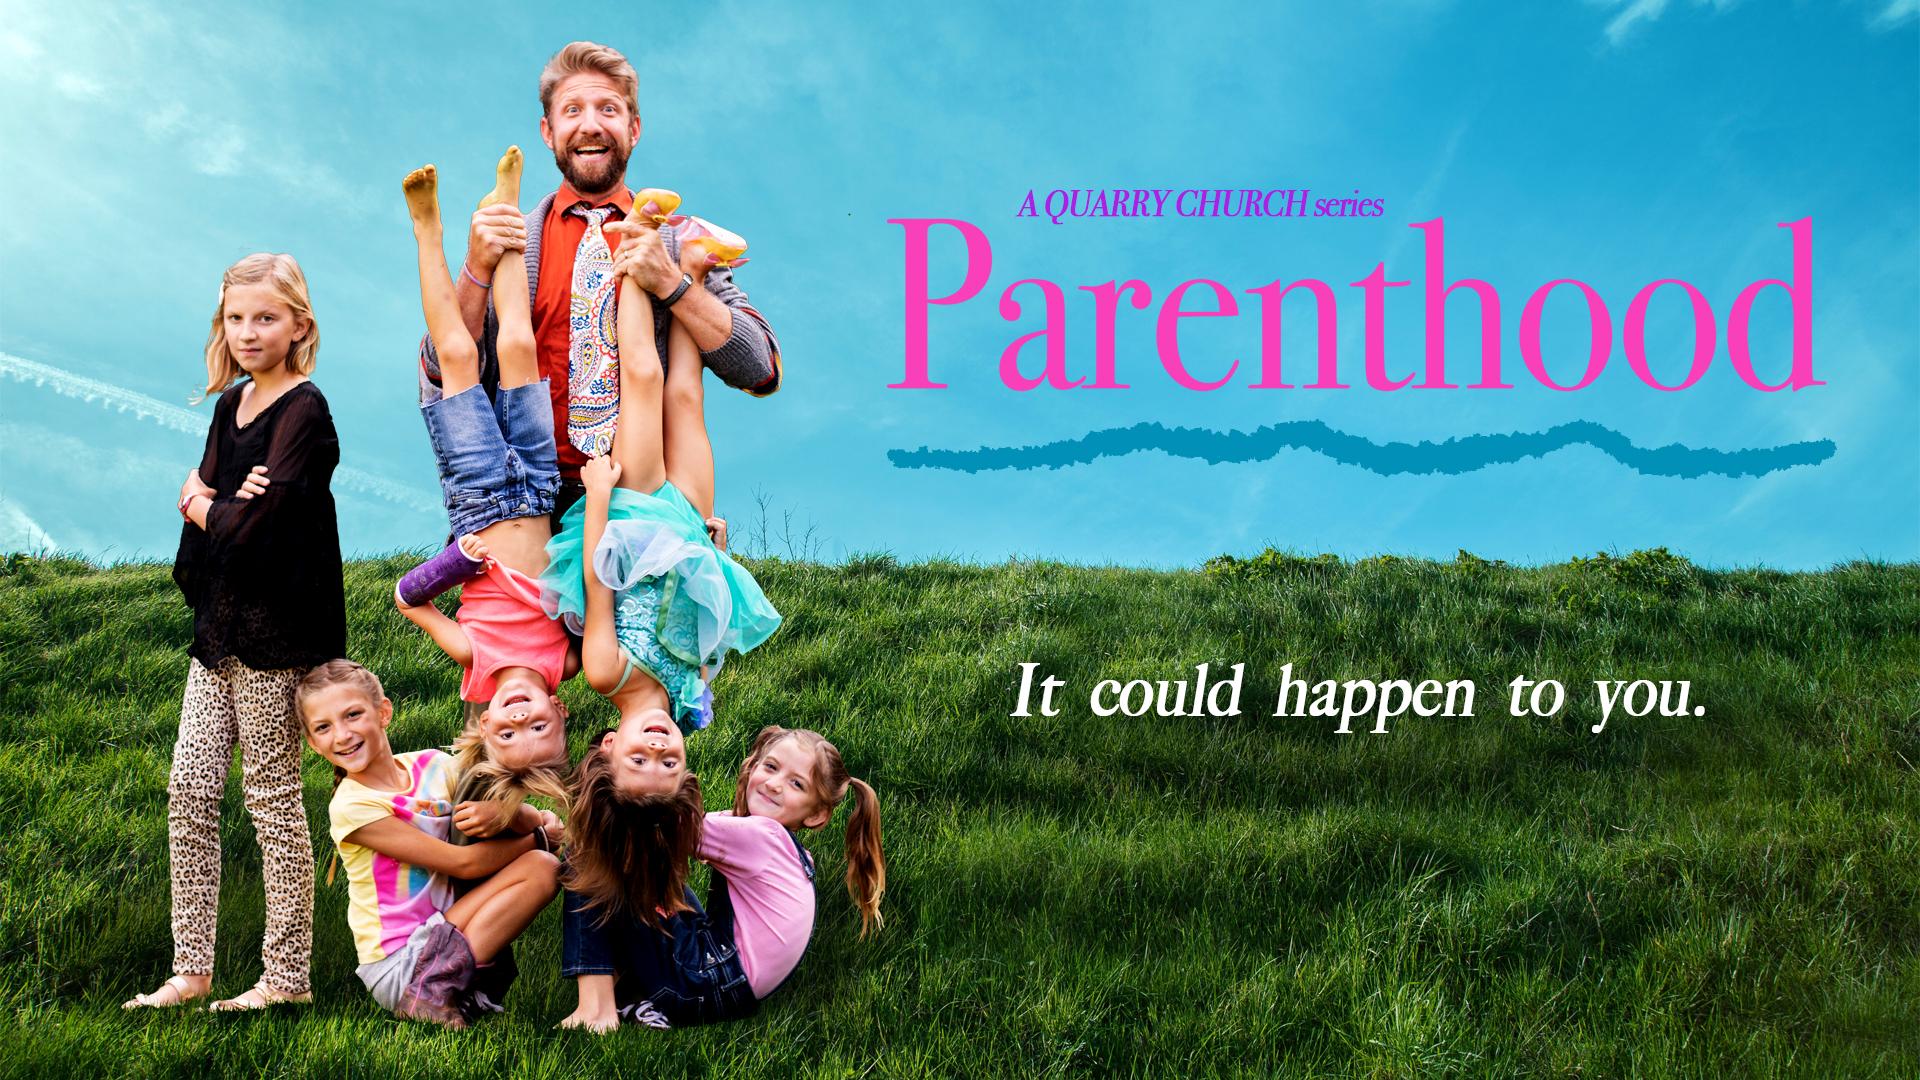 Parenthood: It could happen to you